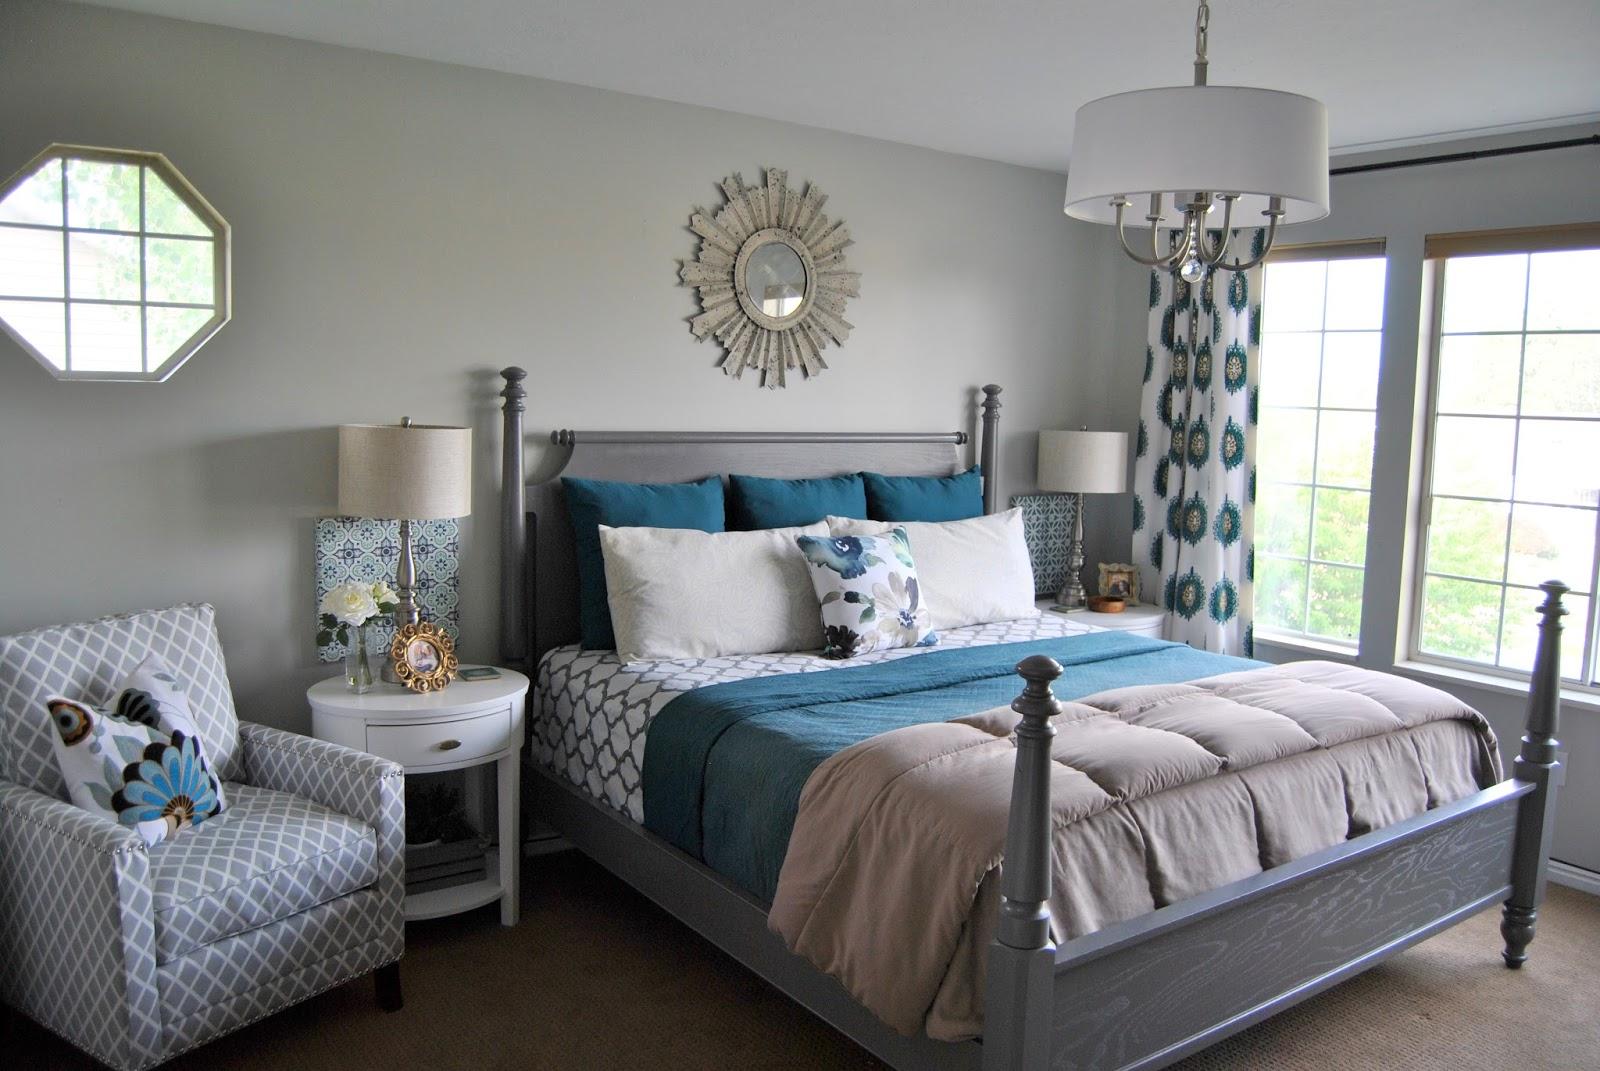 Studio 7 Interior Design: Room Reveal: Master Bedroom